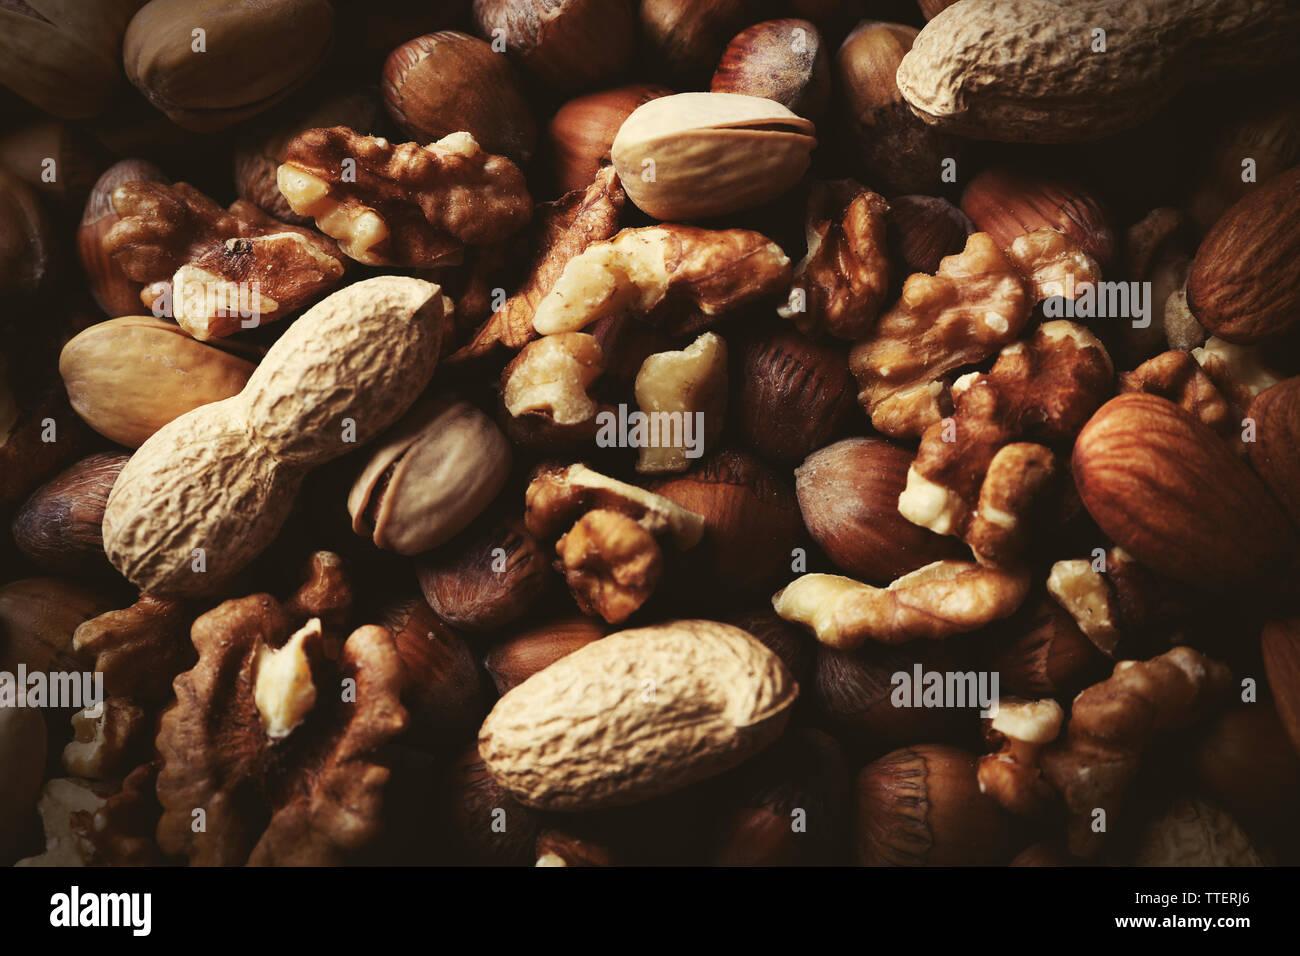 Background of hazelnuts, pistachios, walnuts, almonds, acorns and peanuts Stock Photo